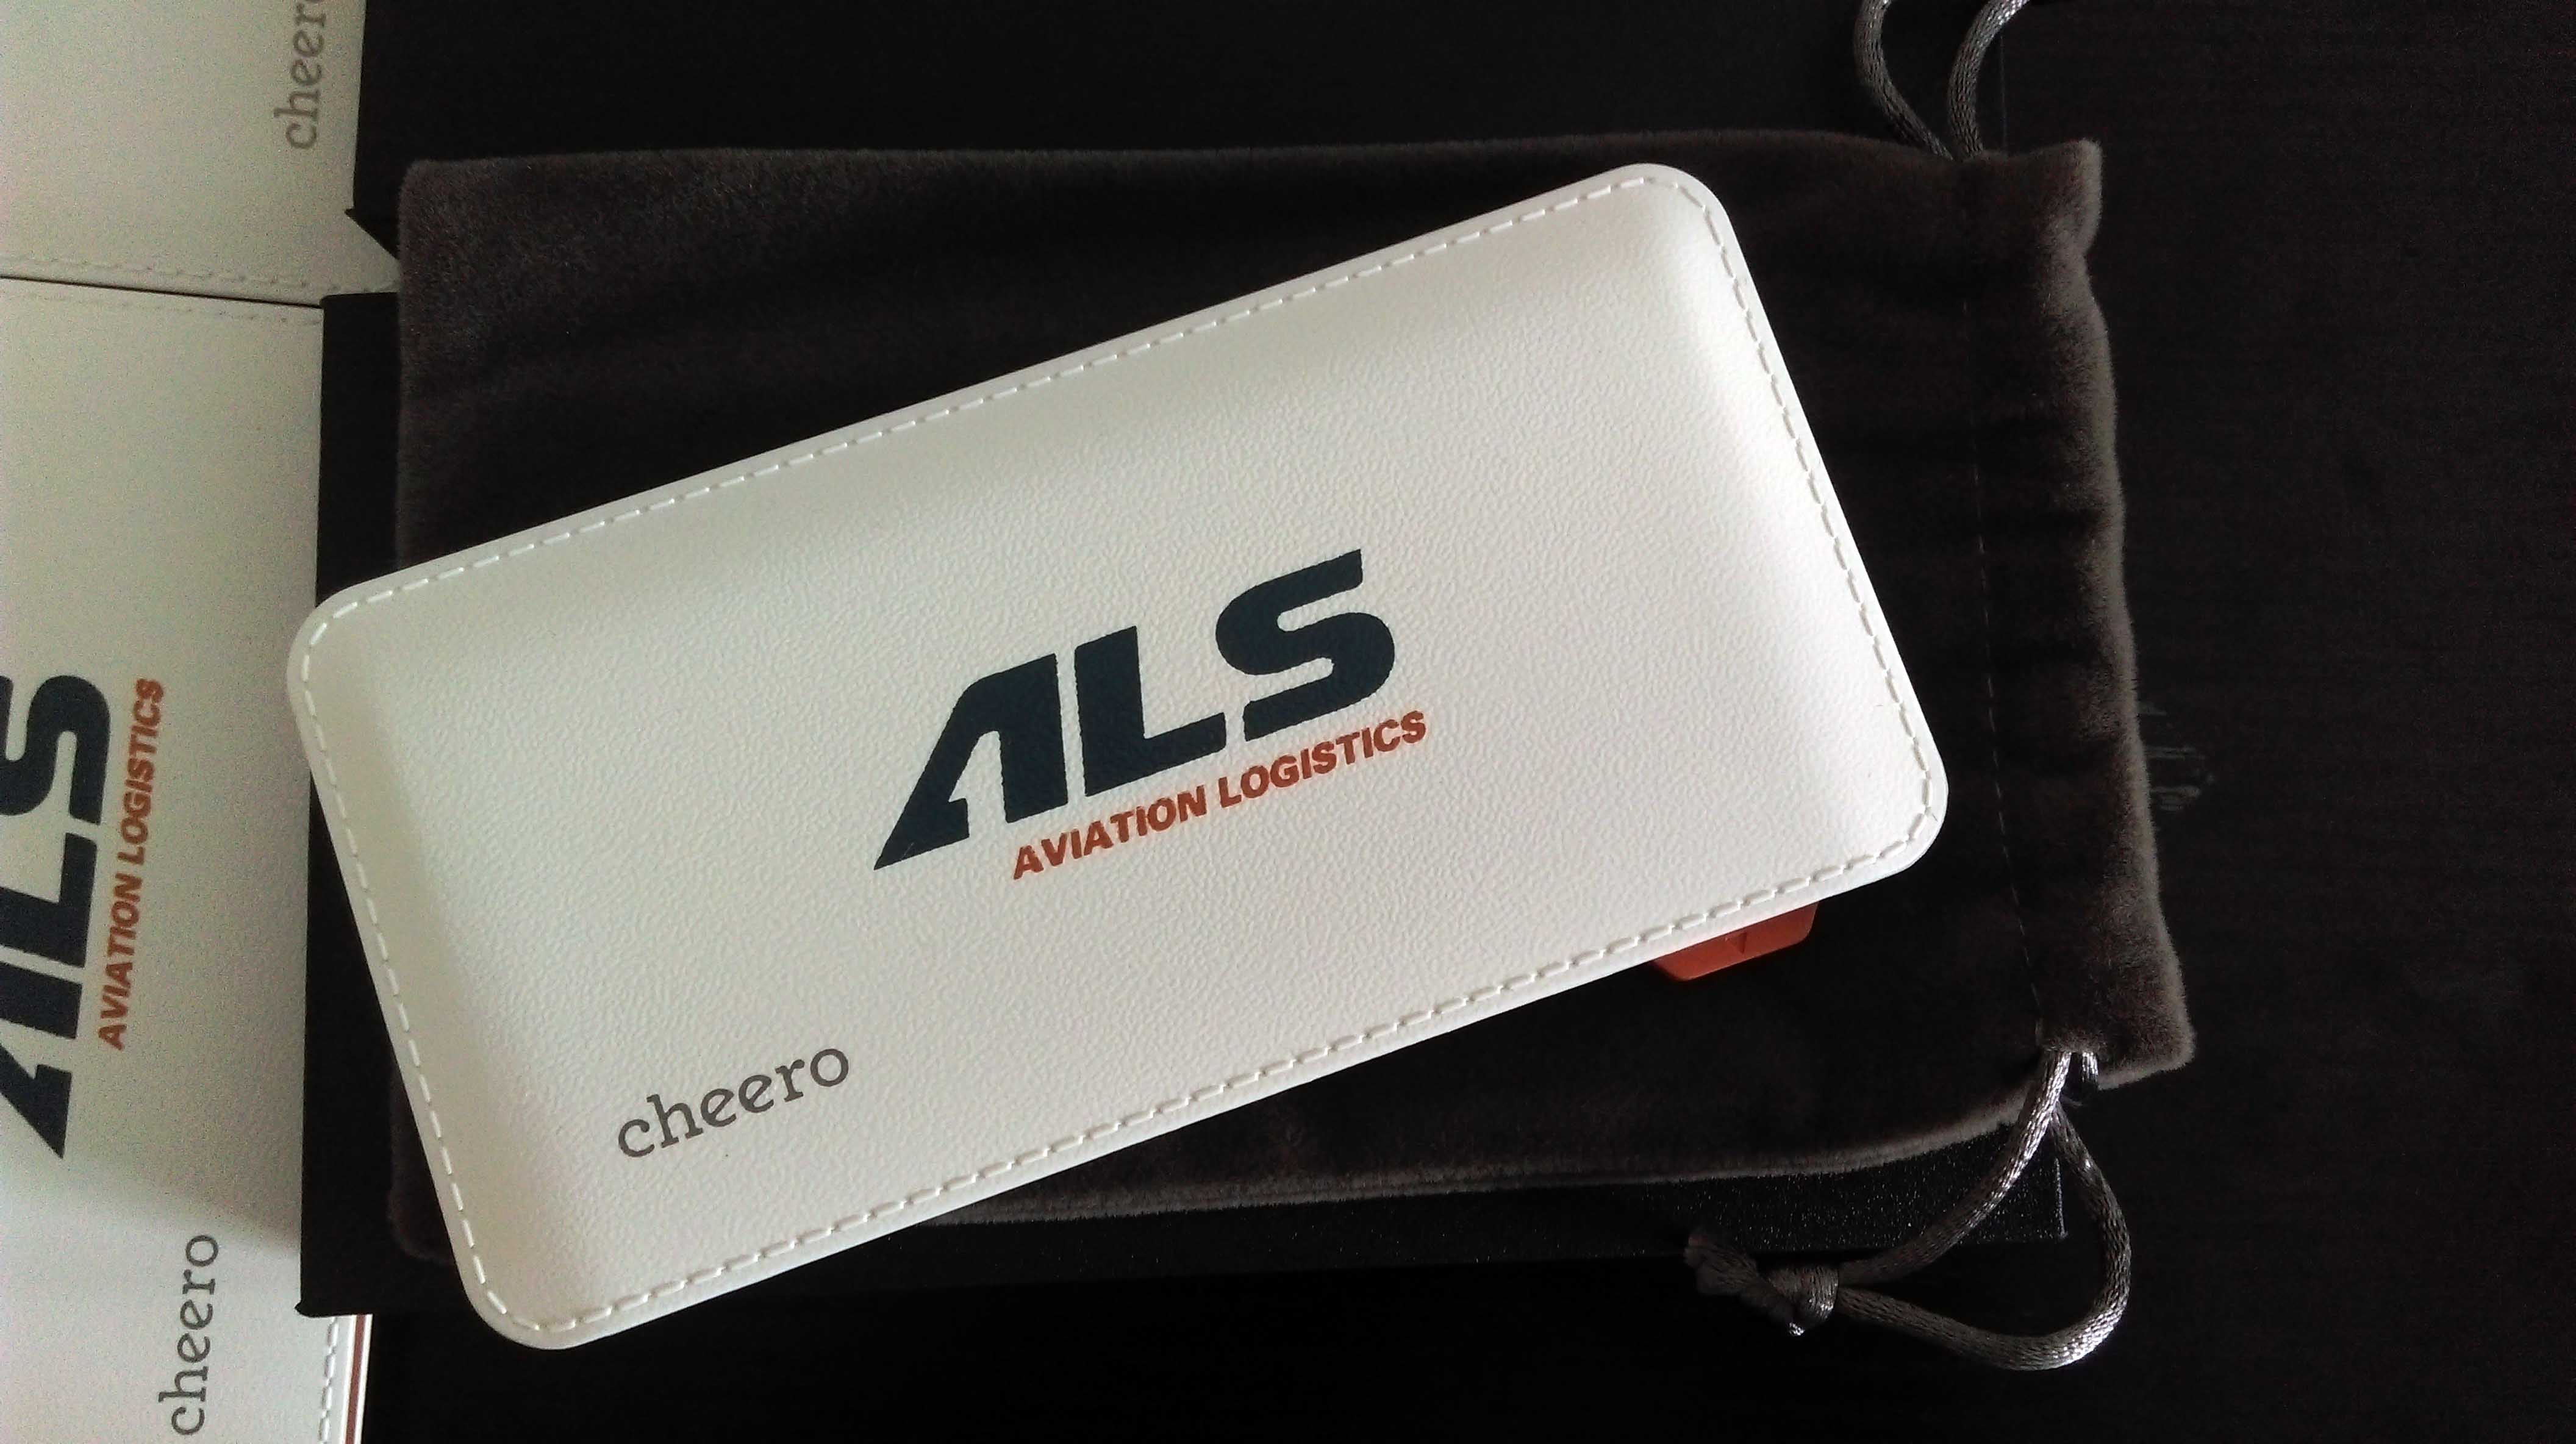 pin sac du phong cherro handy so luong lon ALS Vietnam